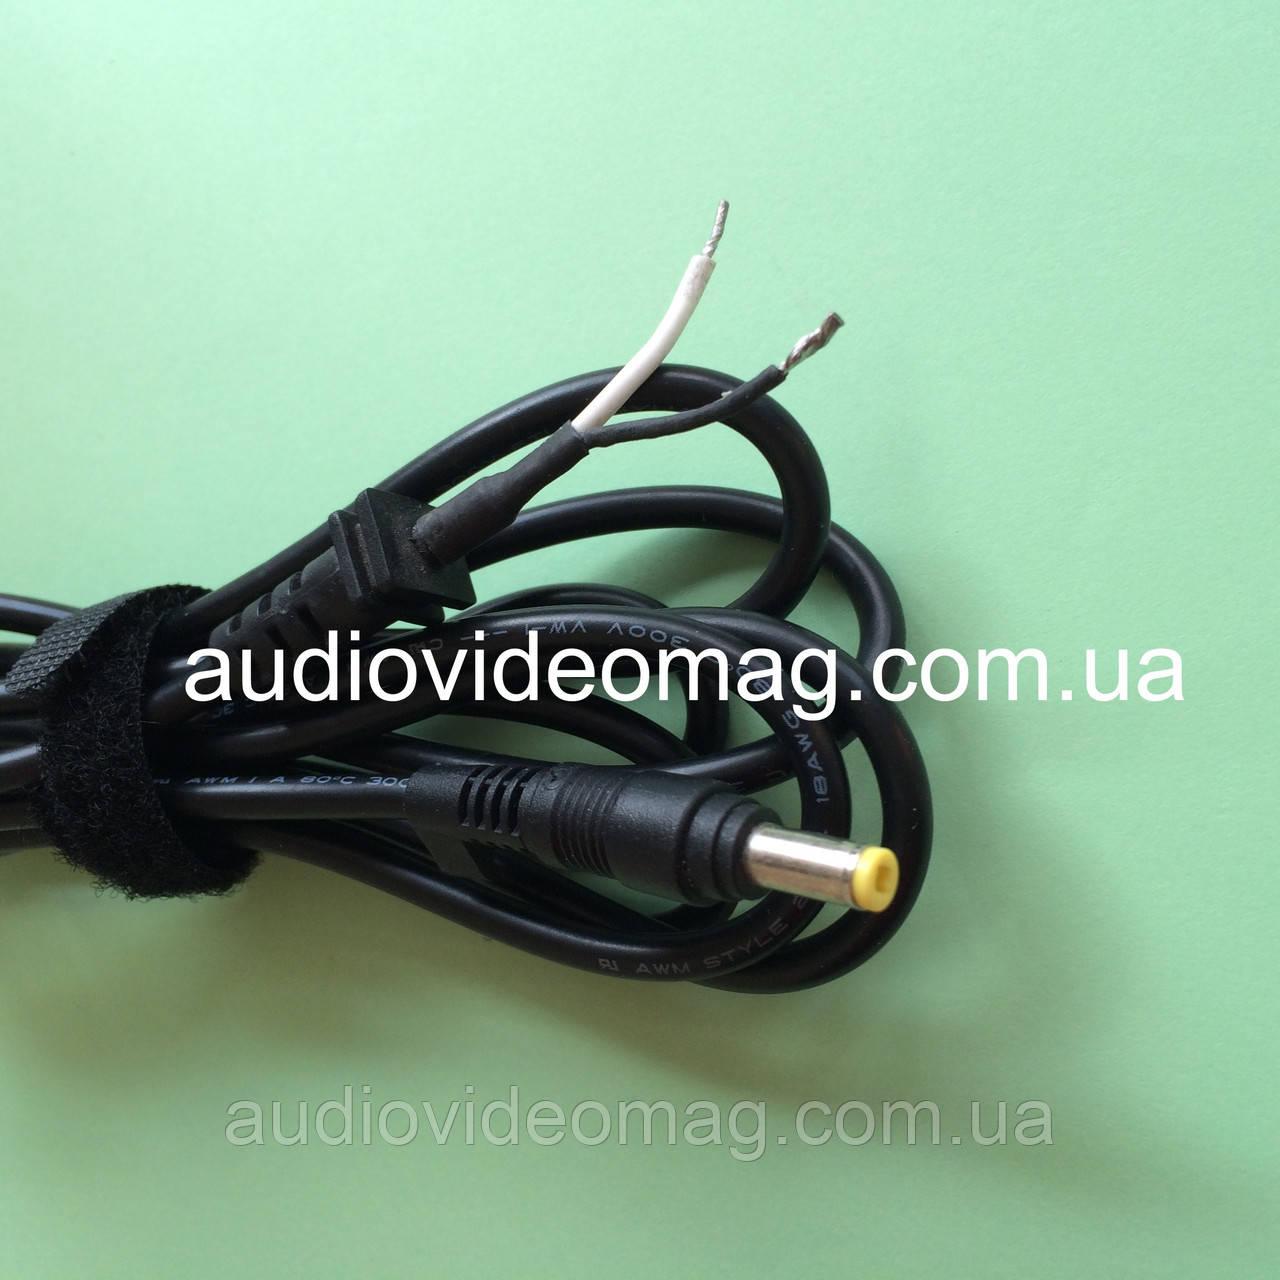 Шнур питания с штекером 4.8-1.7 для ноутбуков (Asus, Sony,HP)